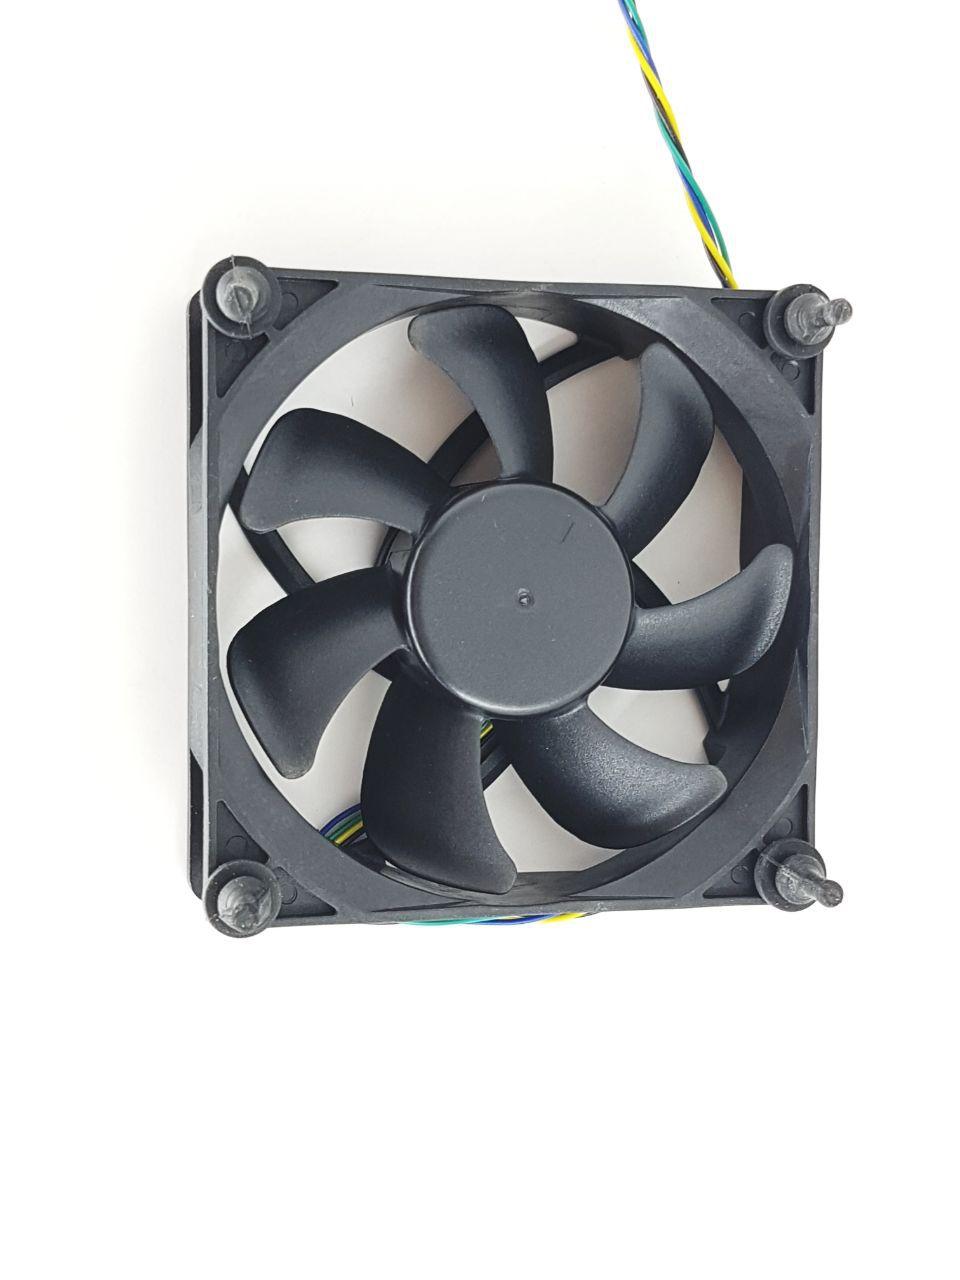 Cooler Ventoinha Delta Qur0912vh 90x90x2.5cm Lenovo